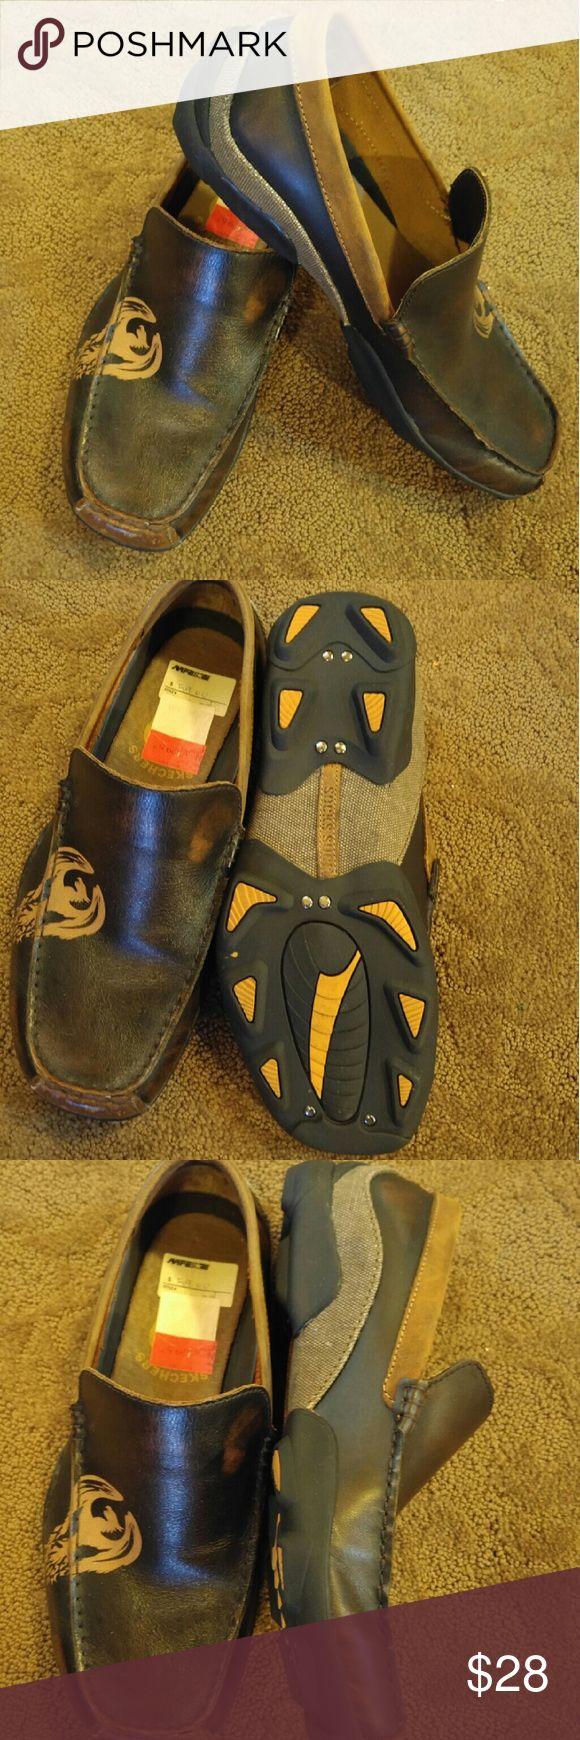 "Men's Skechers slip on shoe Skechers ""Socks Suck"" canvas and leather slip on men's shoe.  Never worn. Skechers Shoes Loafers & Slip-Ons"